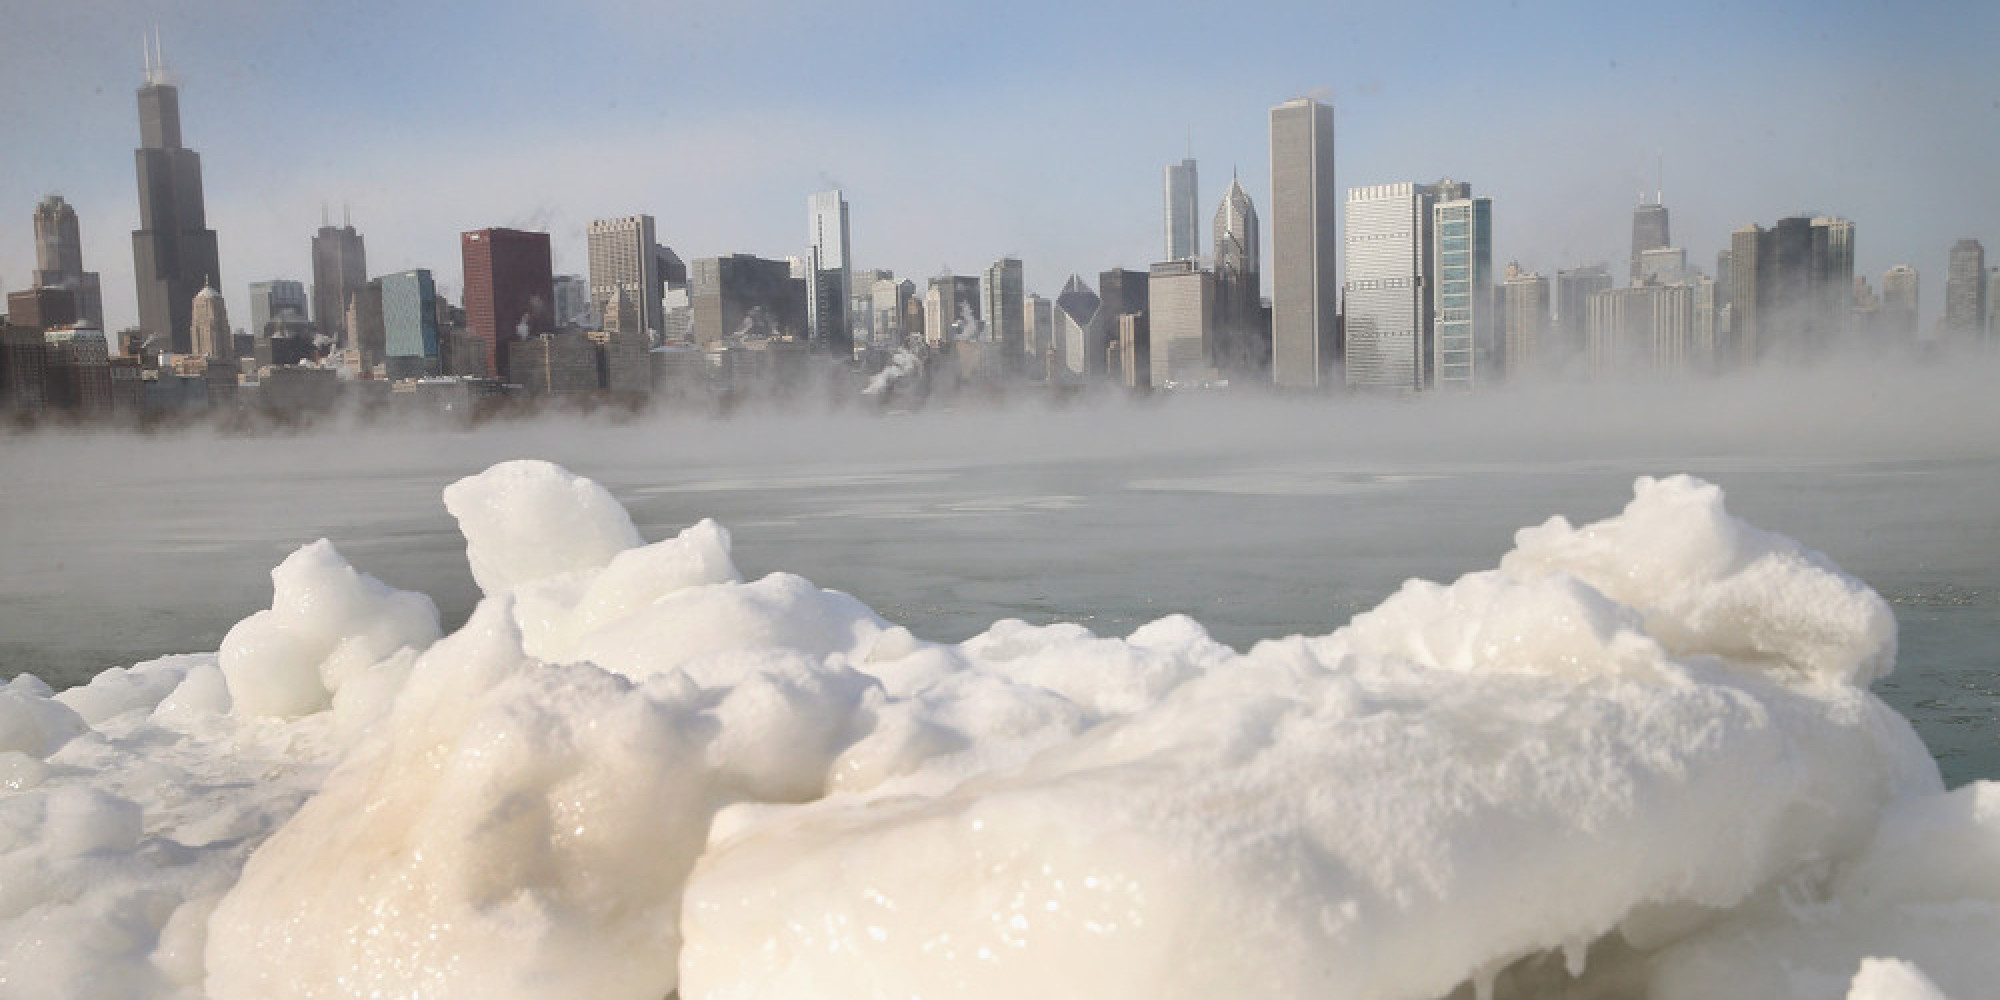 chicago weather - photo #14